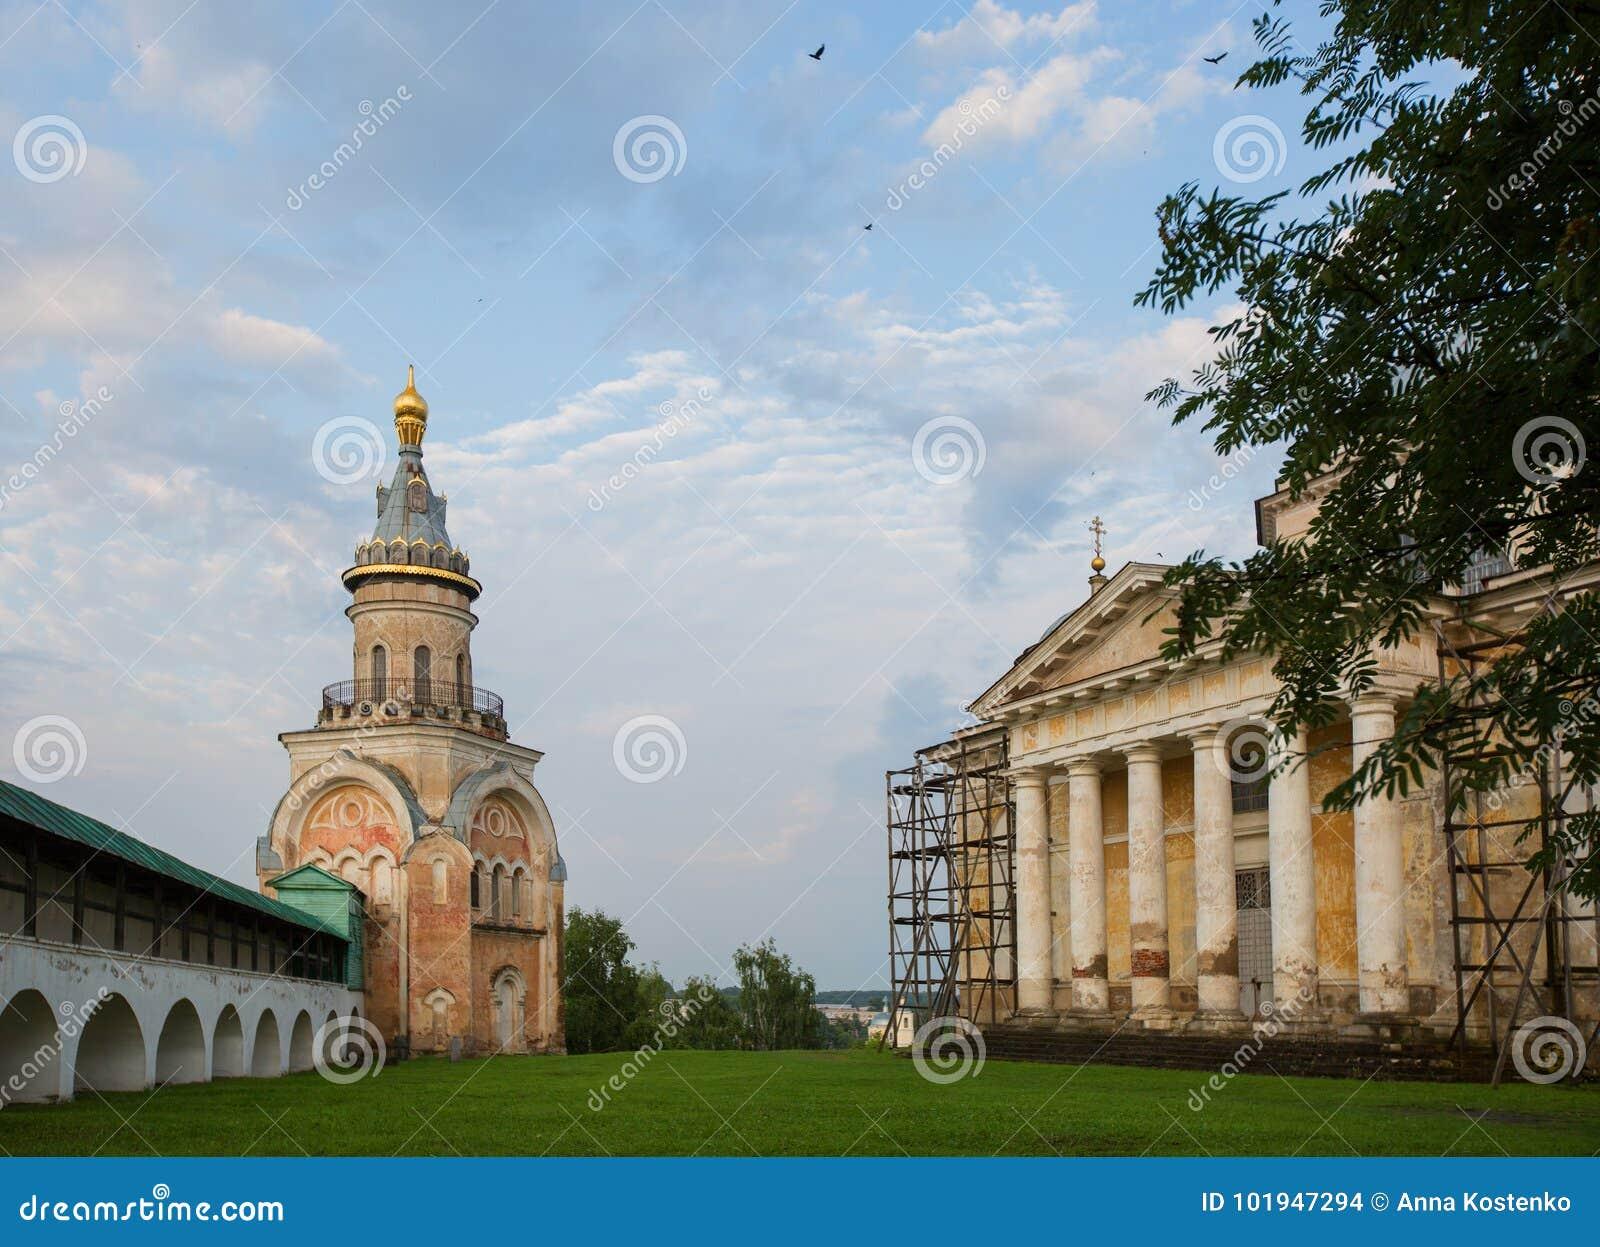 Borisoglebsky Monastery in Dmitrov. History, description, interesting facts 36